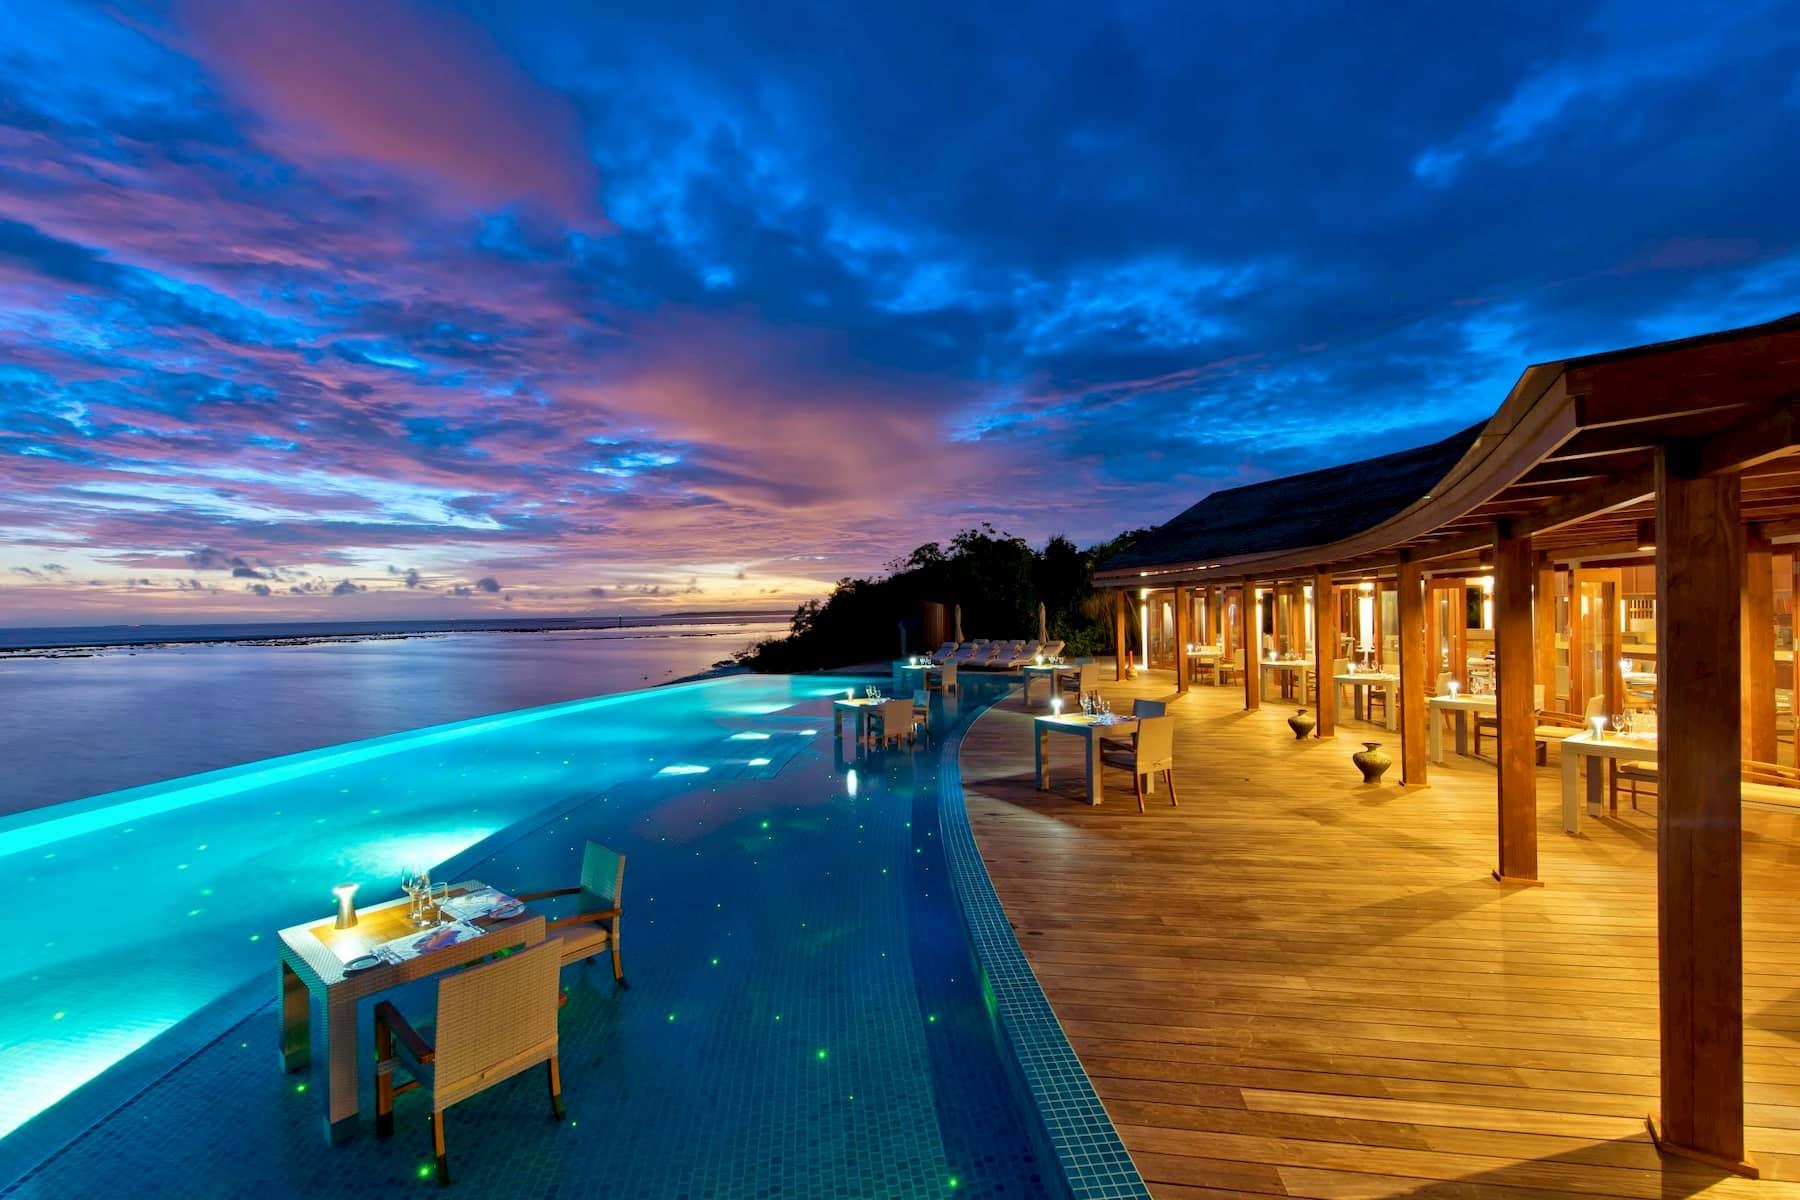 Resort Maldive Hideway Beach Resort & Spa ristorante sunset pool cafe